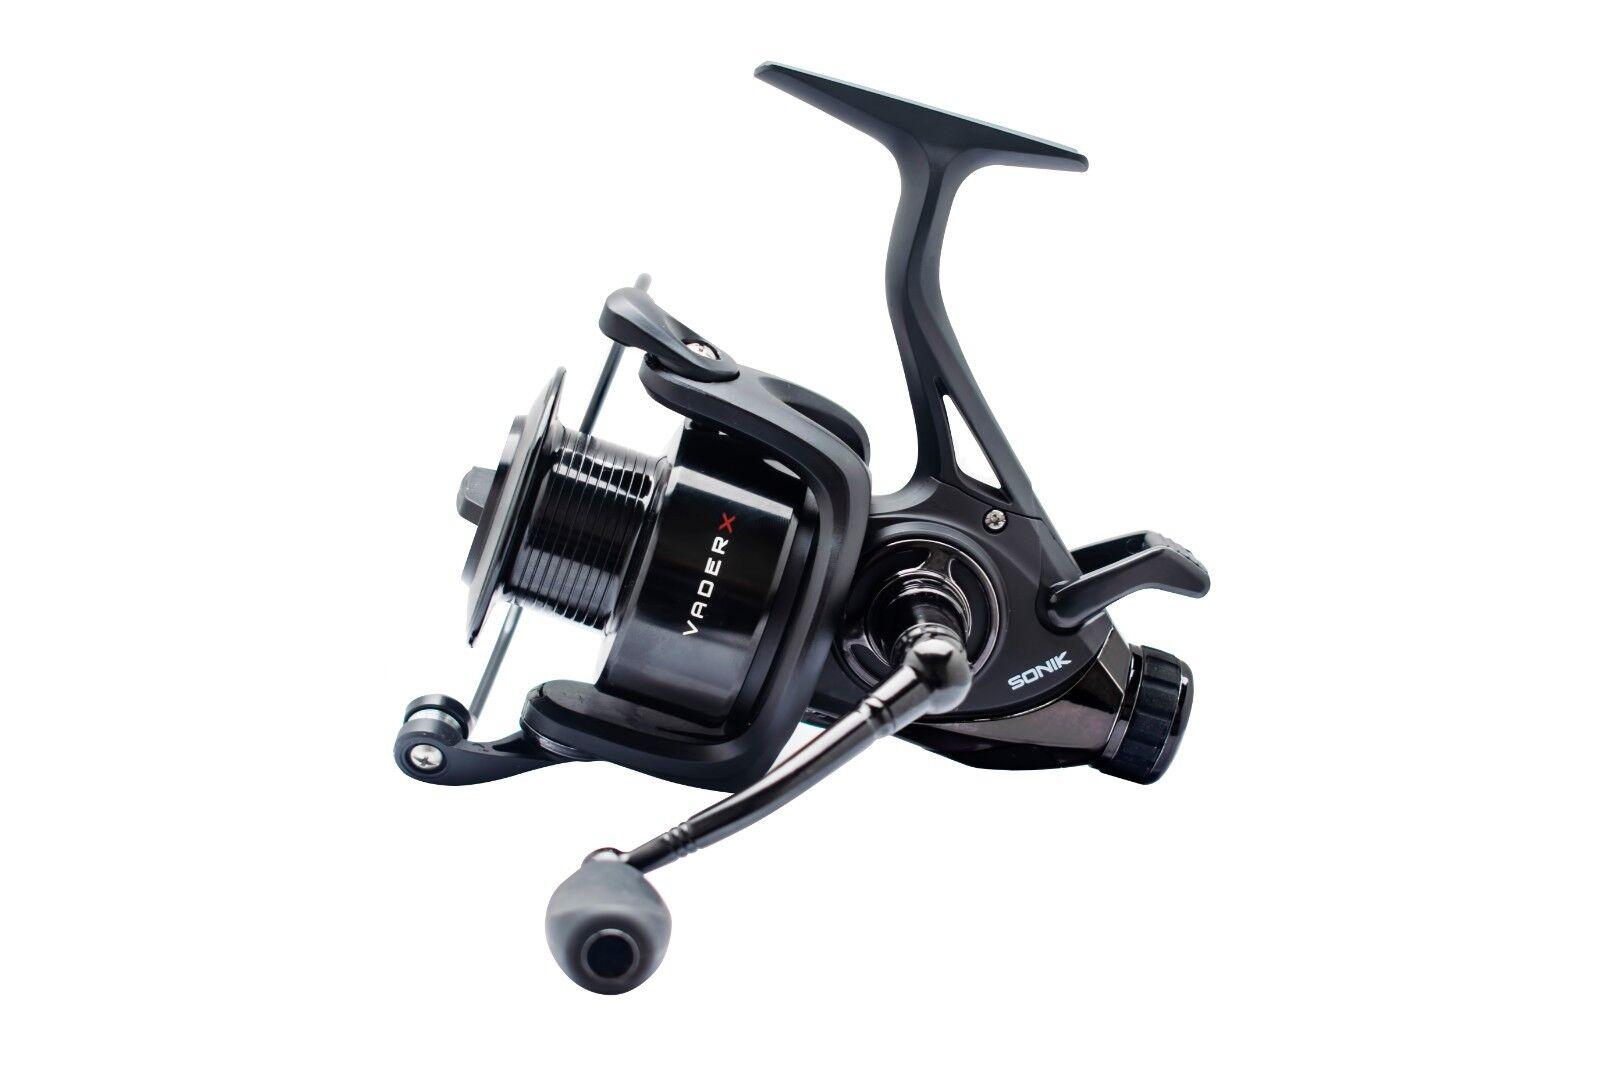 Sonik 2x Vader X FS Reel Both Both Both Models NEW Freespool Fishing Reel b50f12